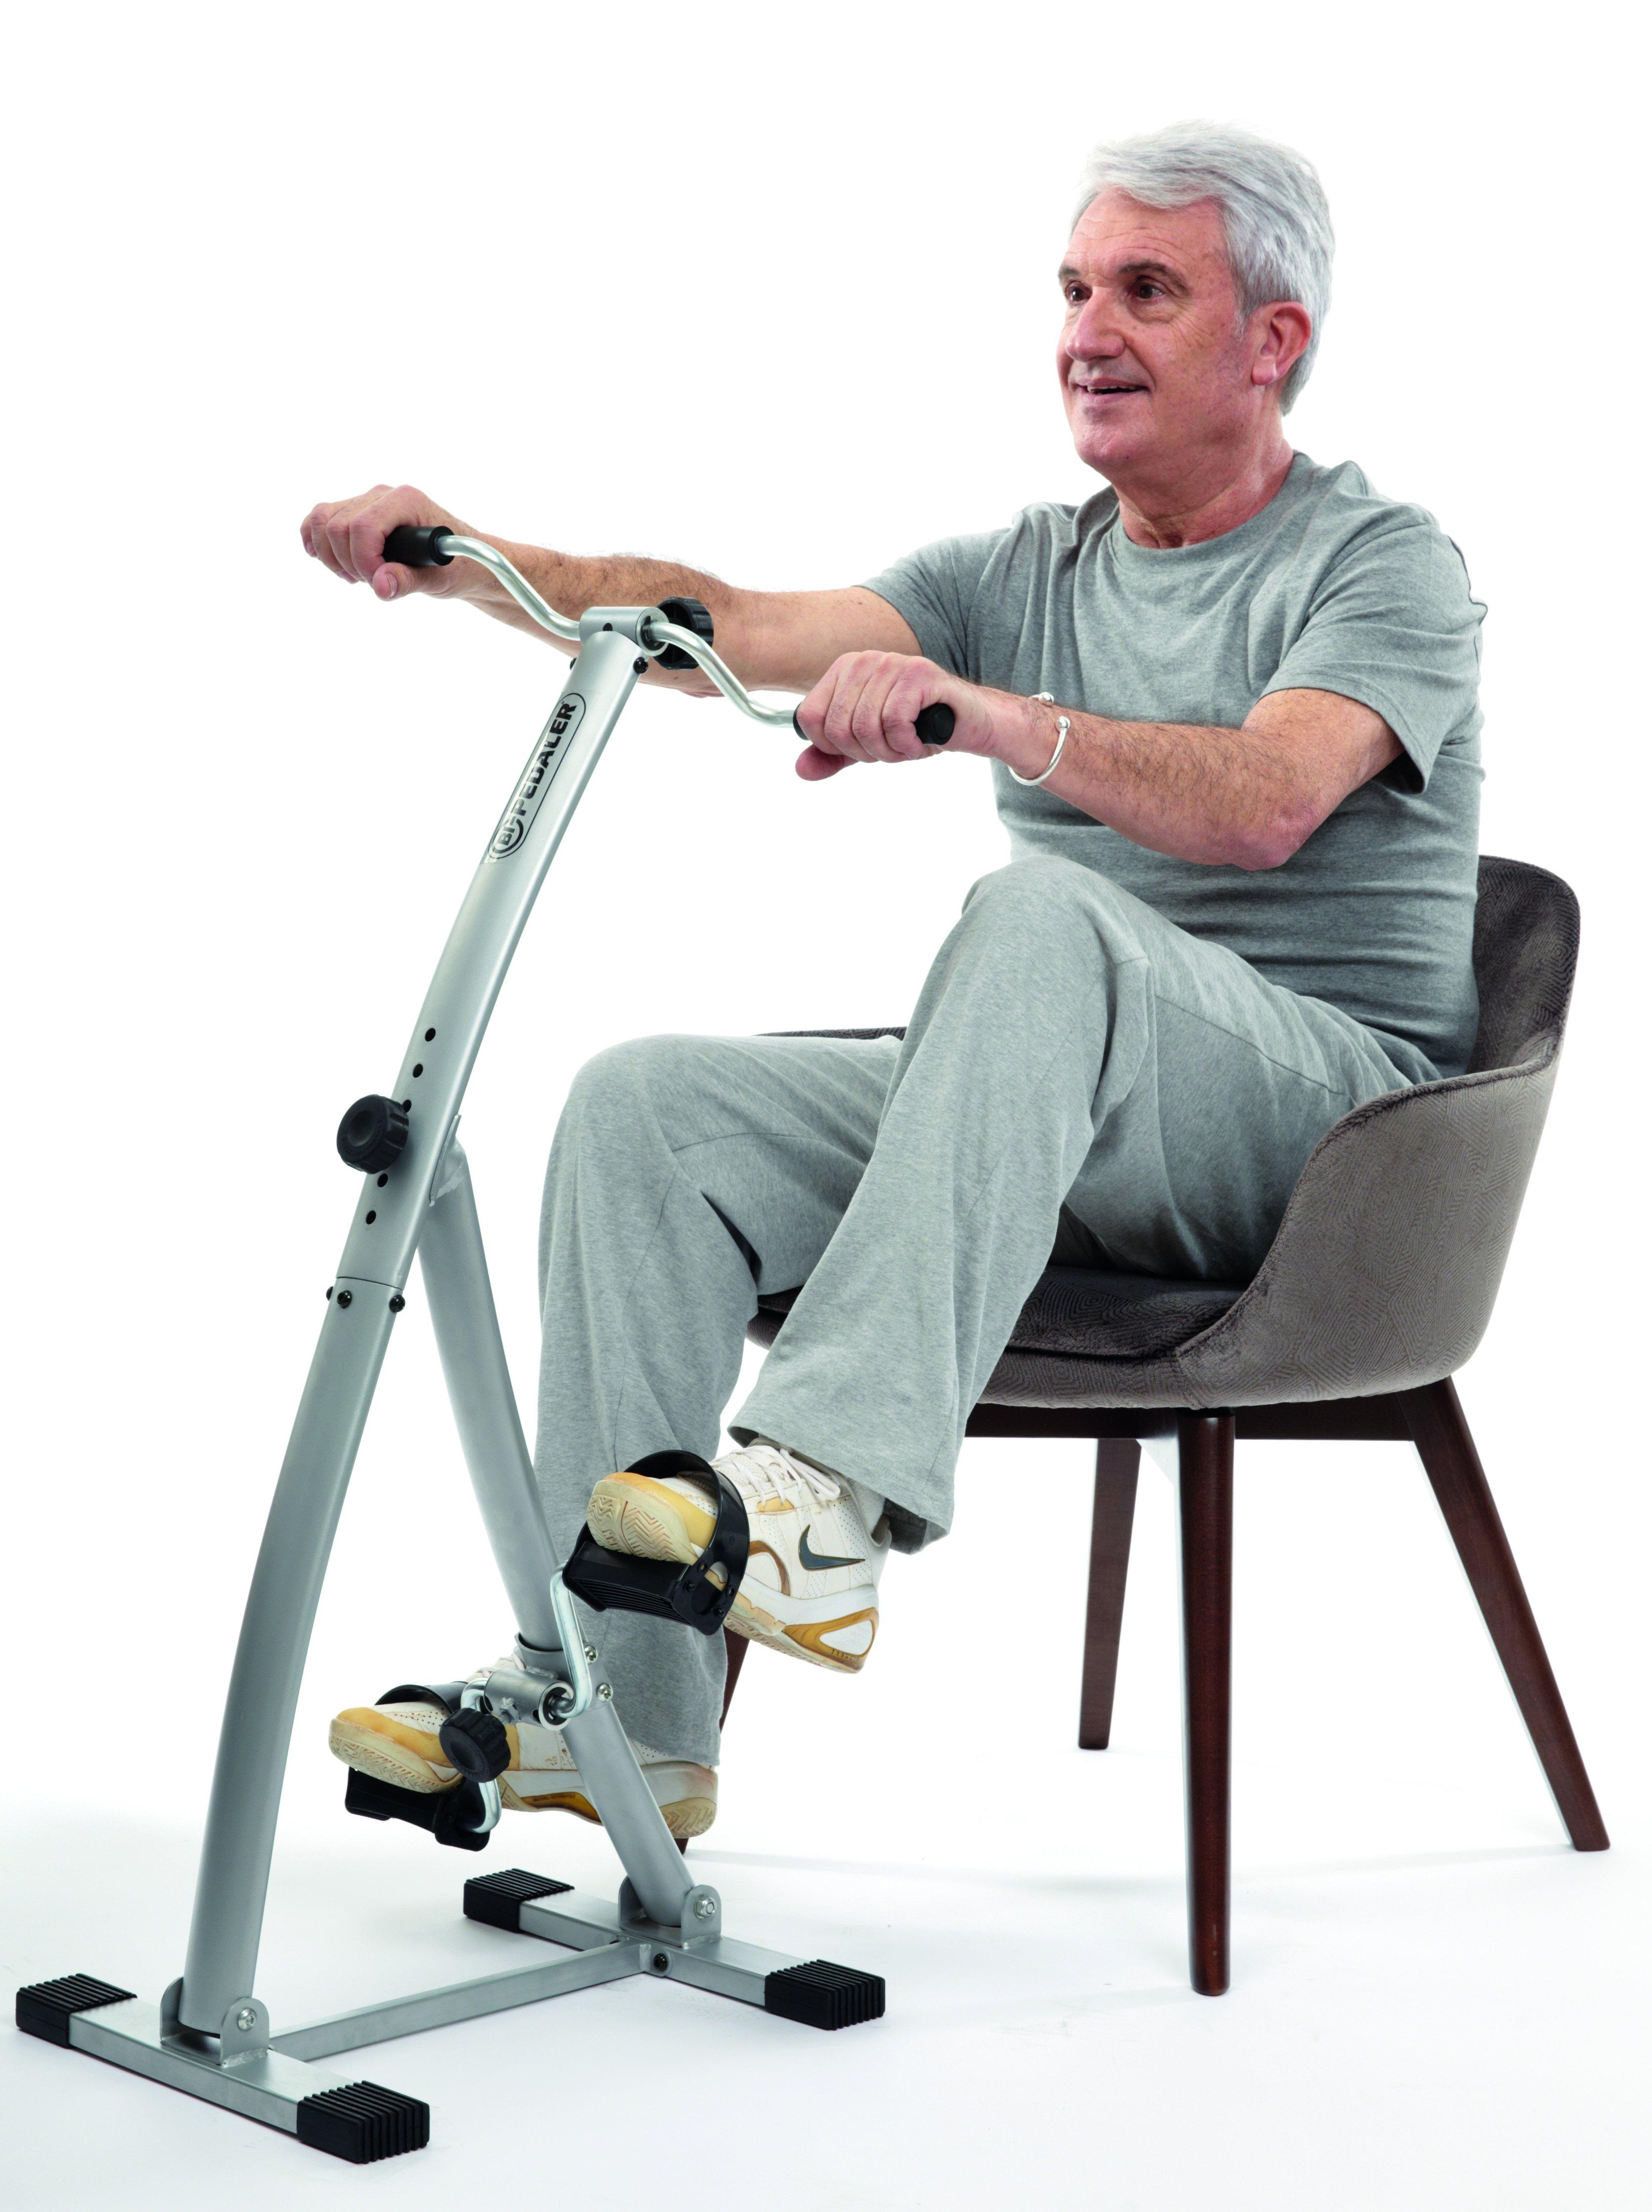 Bi-Pedaler trainingsapparaat voor thuis